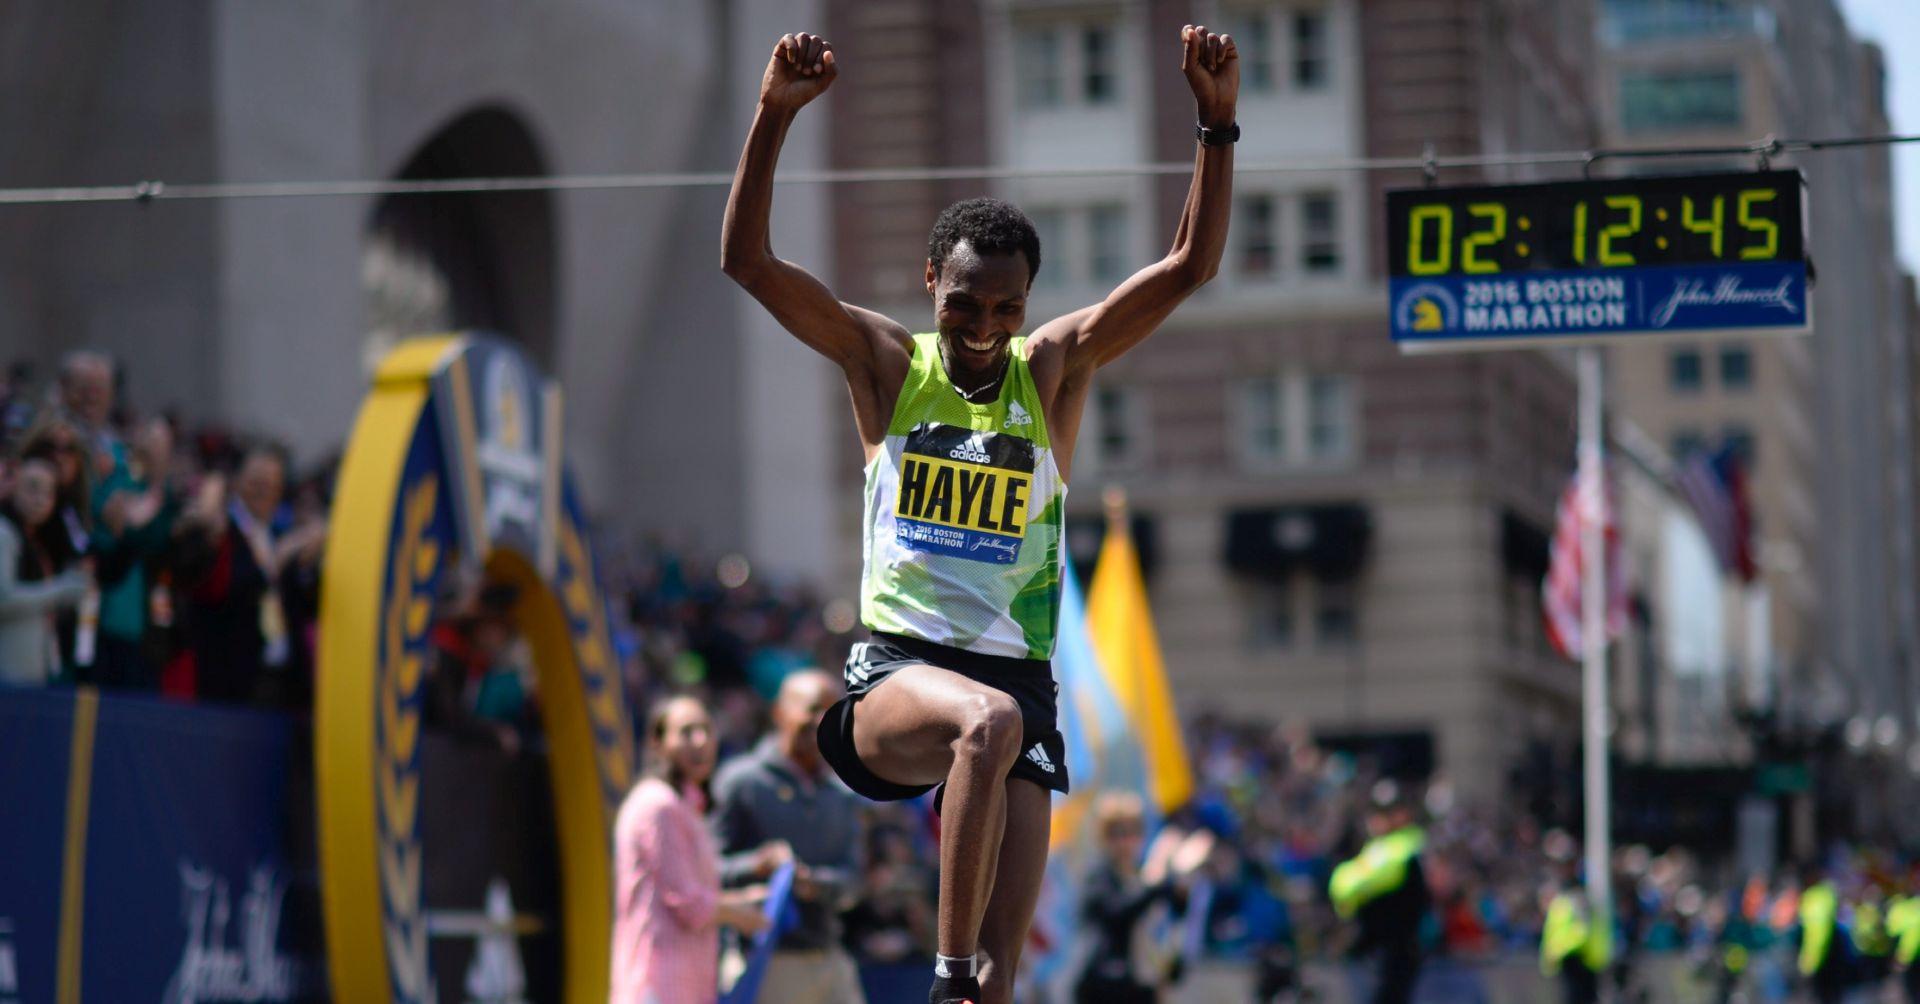 Etiopljani dominirali Bostonskim maratonom